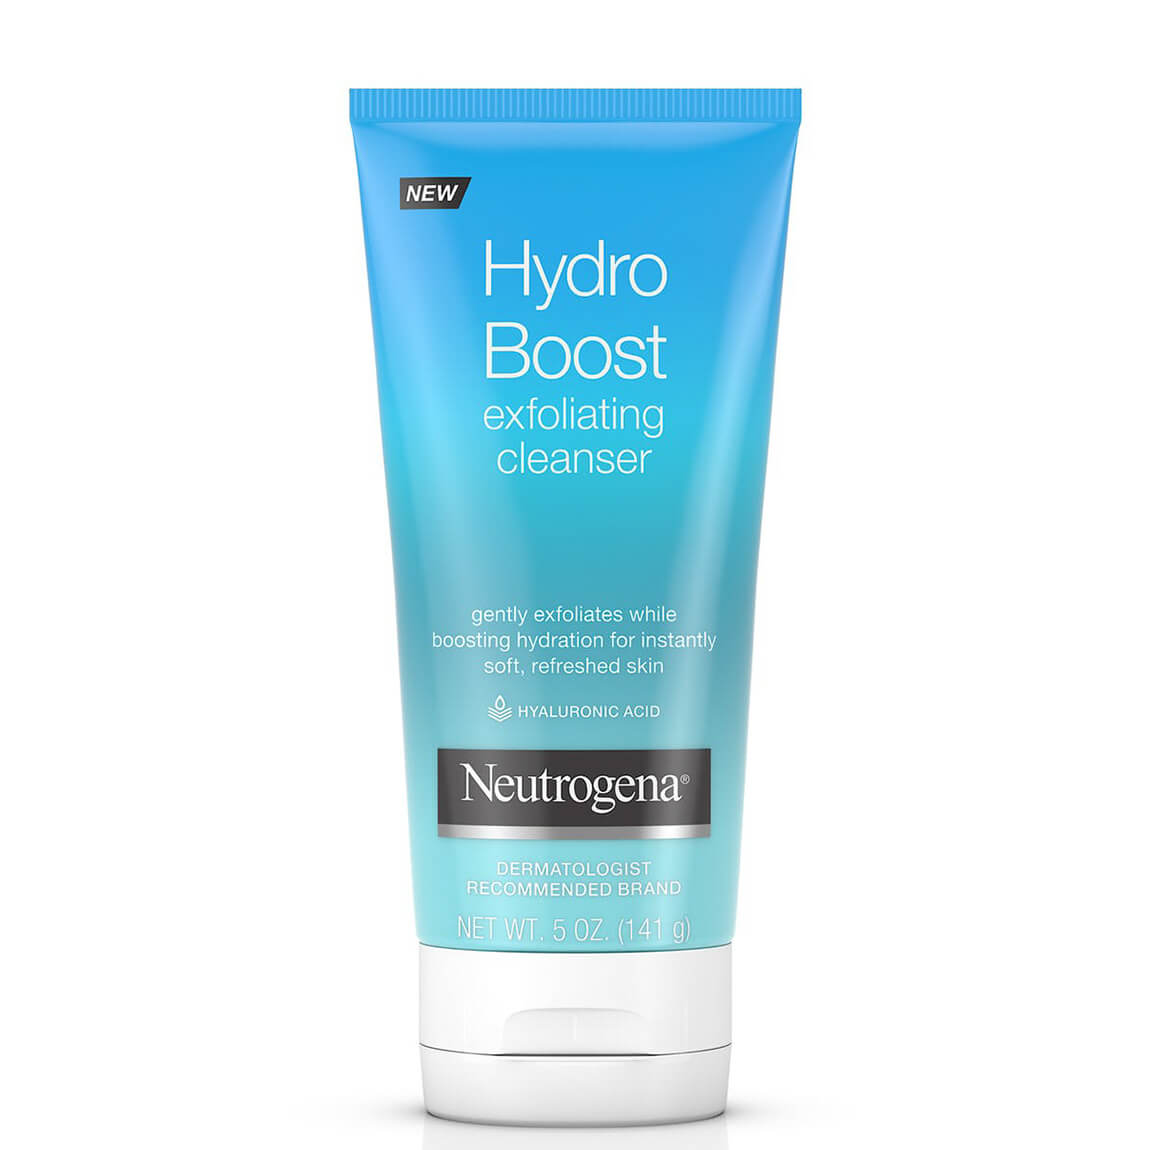 Neutrogena Hydro Boost Gentle Exfoliating Cleanser